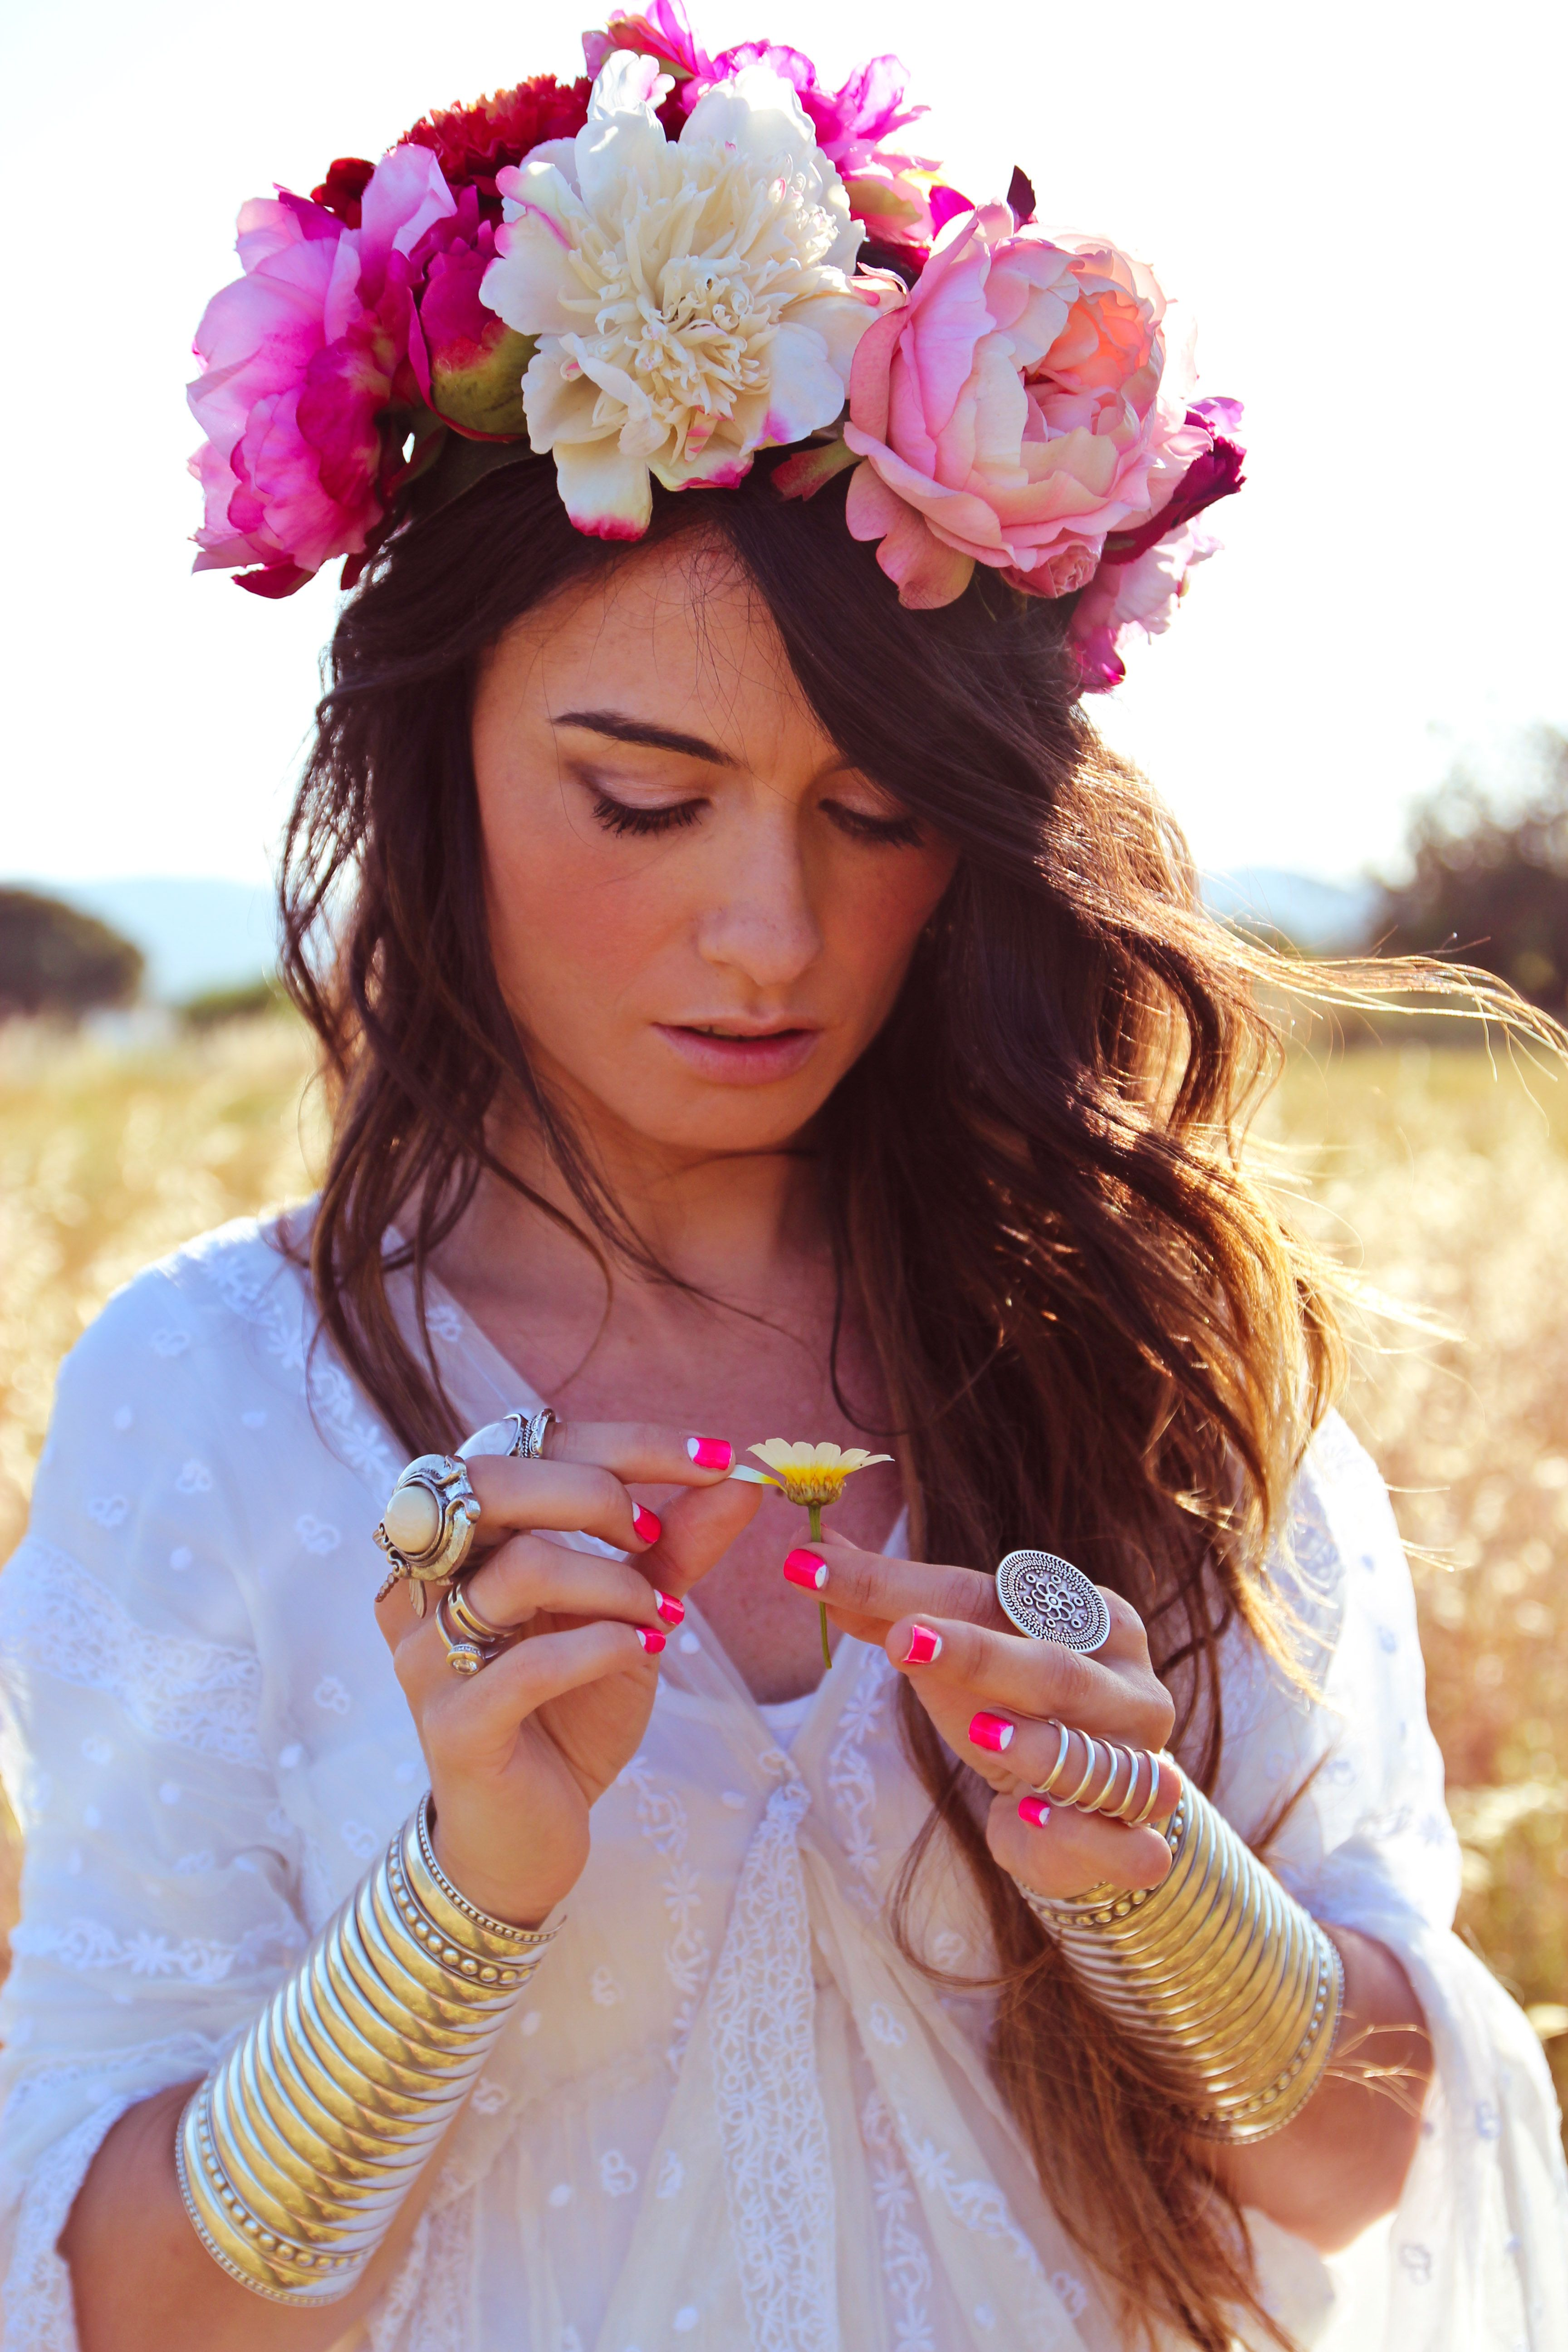 Flowered Crown Bracelets Hippy Dress Boho Chic Pinterest